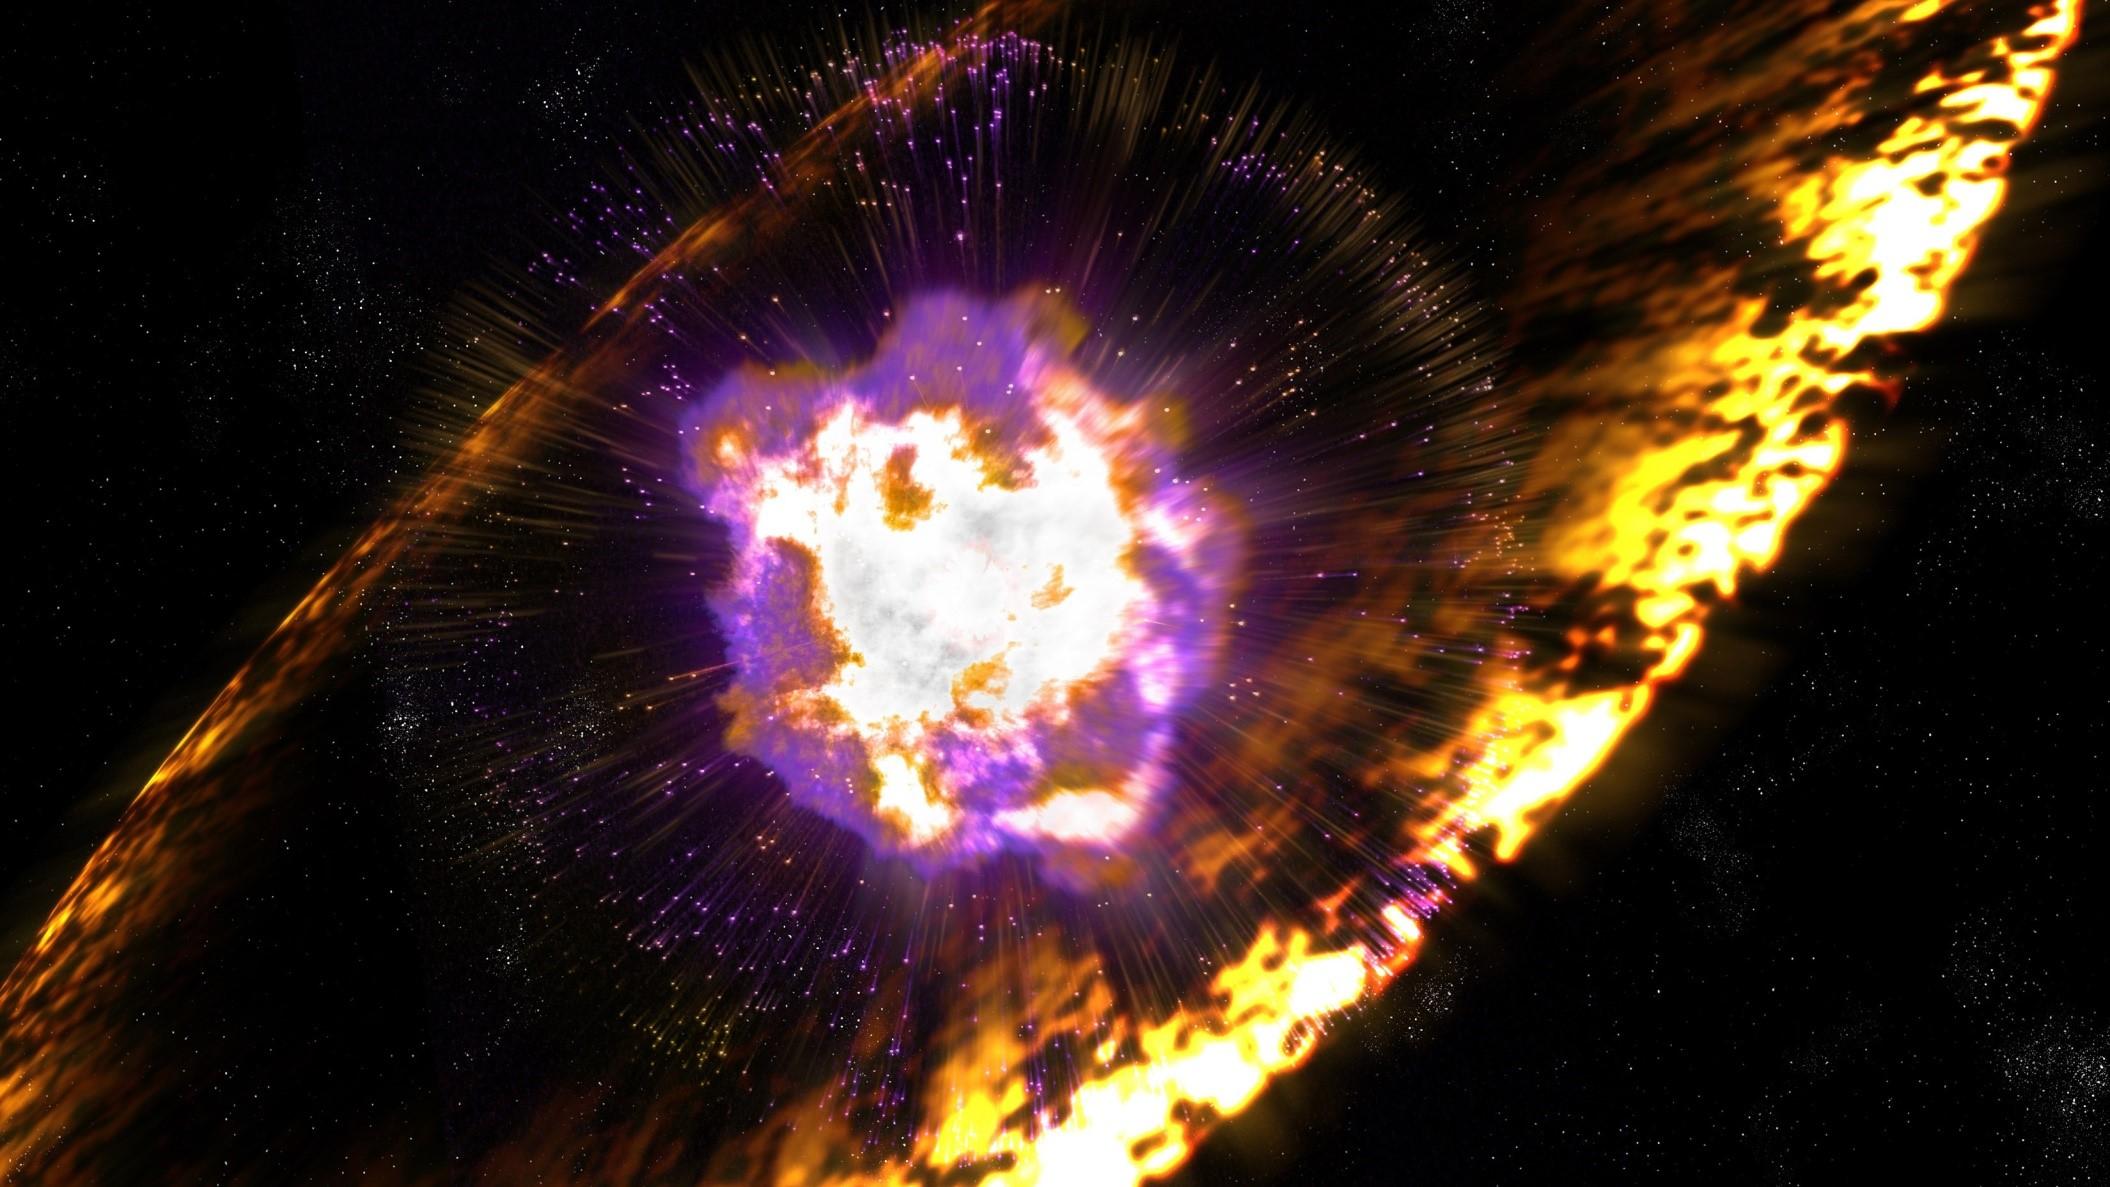 supernova element formation - HD1440×809